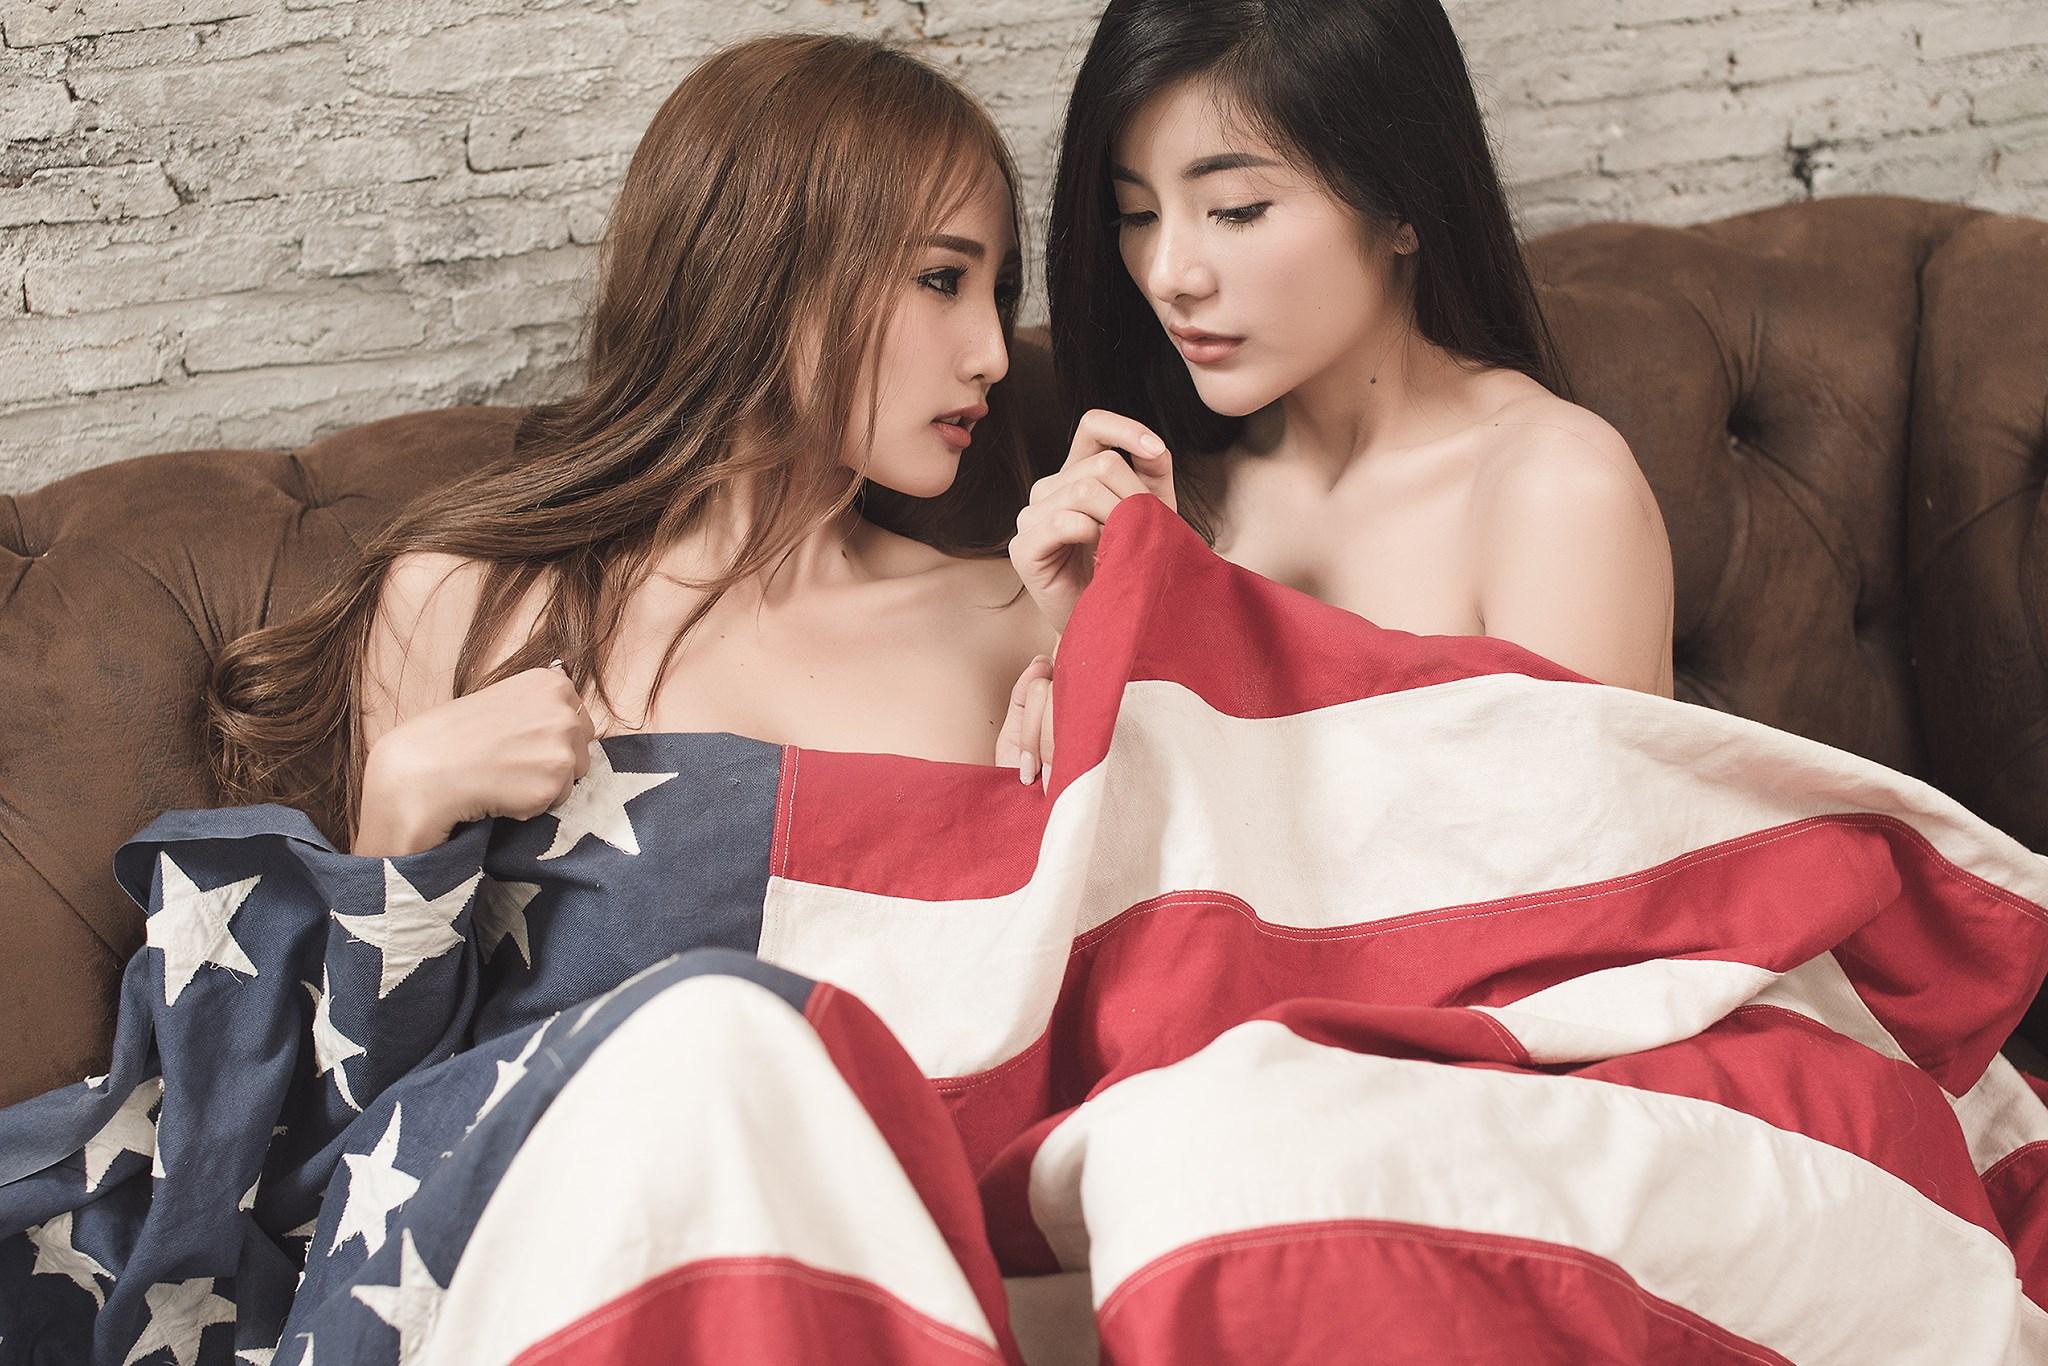 Sisters - Supitcha Boonkumphoung & Ployprabhat Seematammaruk